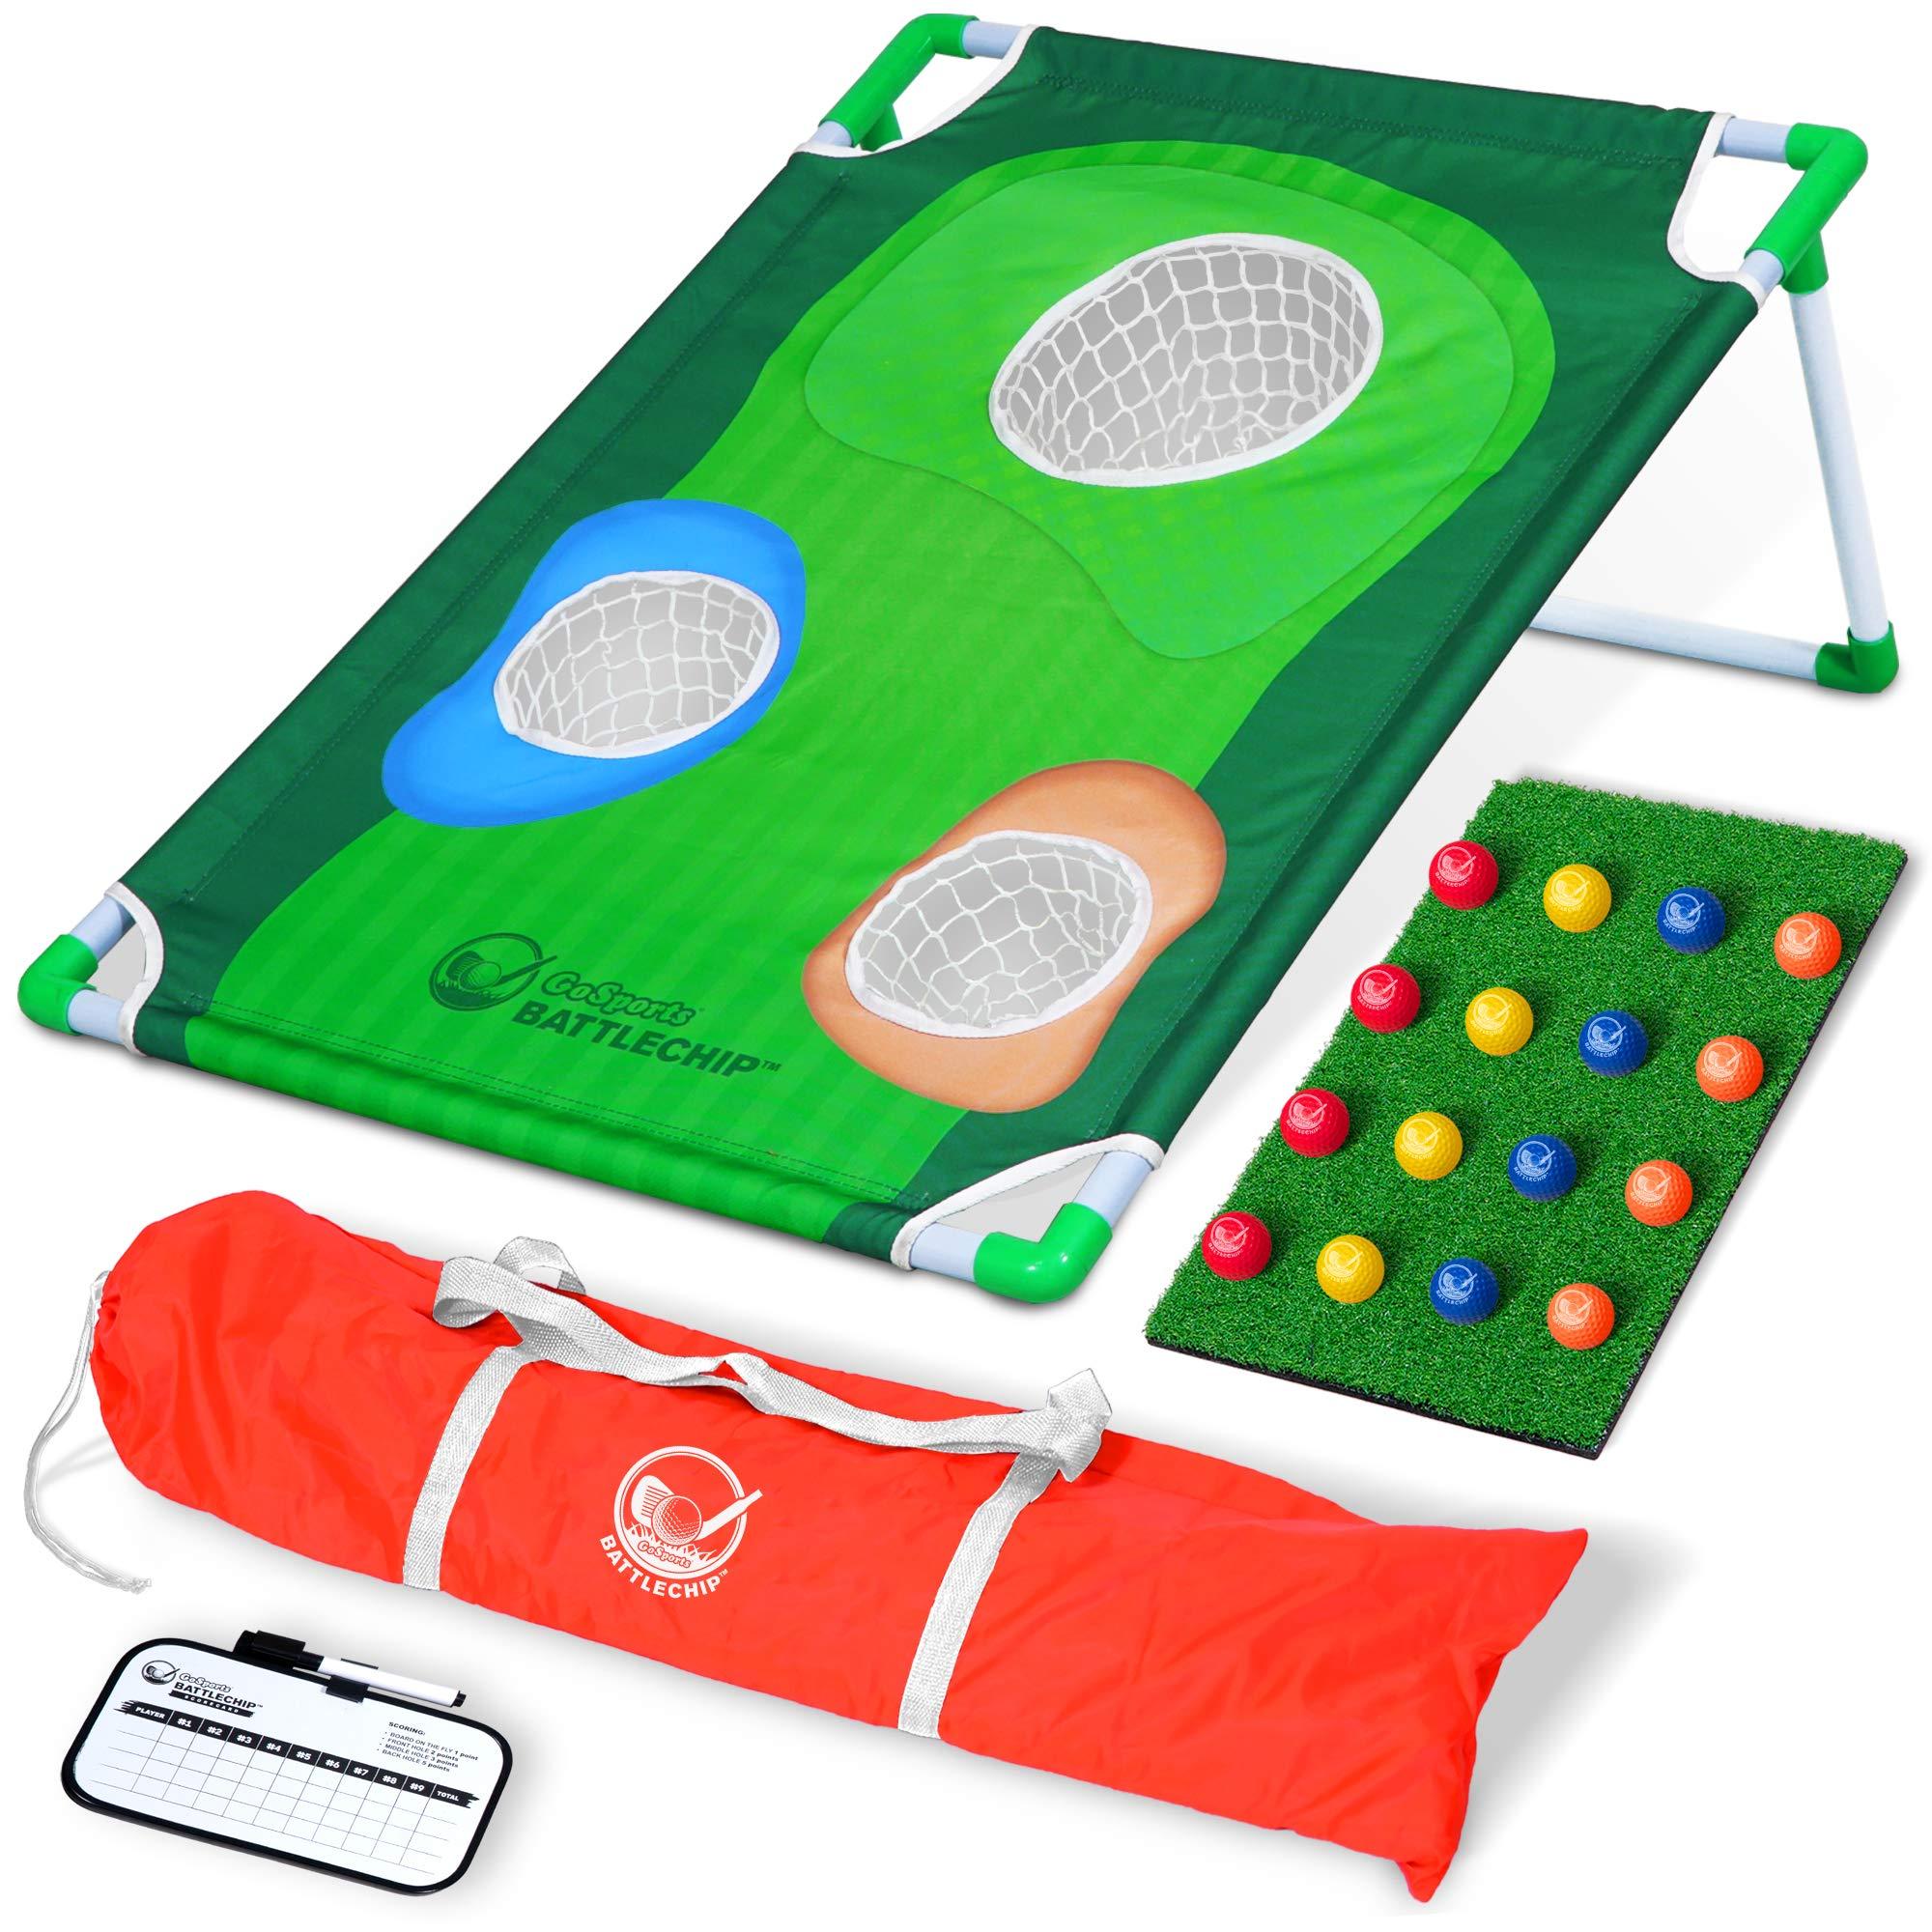 GoSports BattleChip Backyard Golf Cornhole Game   Includes Chipping Target, 16 Foam Balls, Hitting Mat and Carrying Case by GoSports